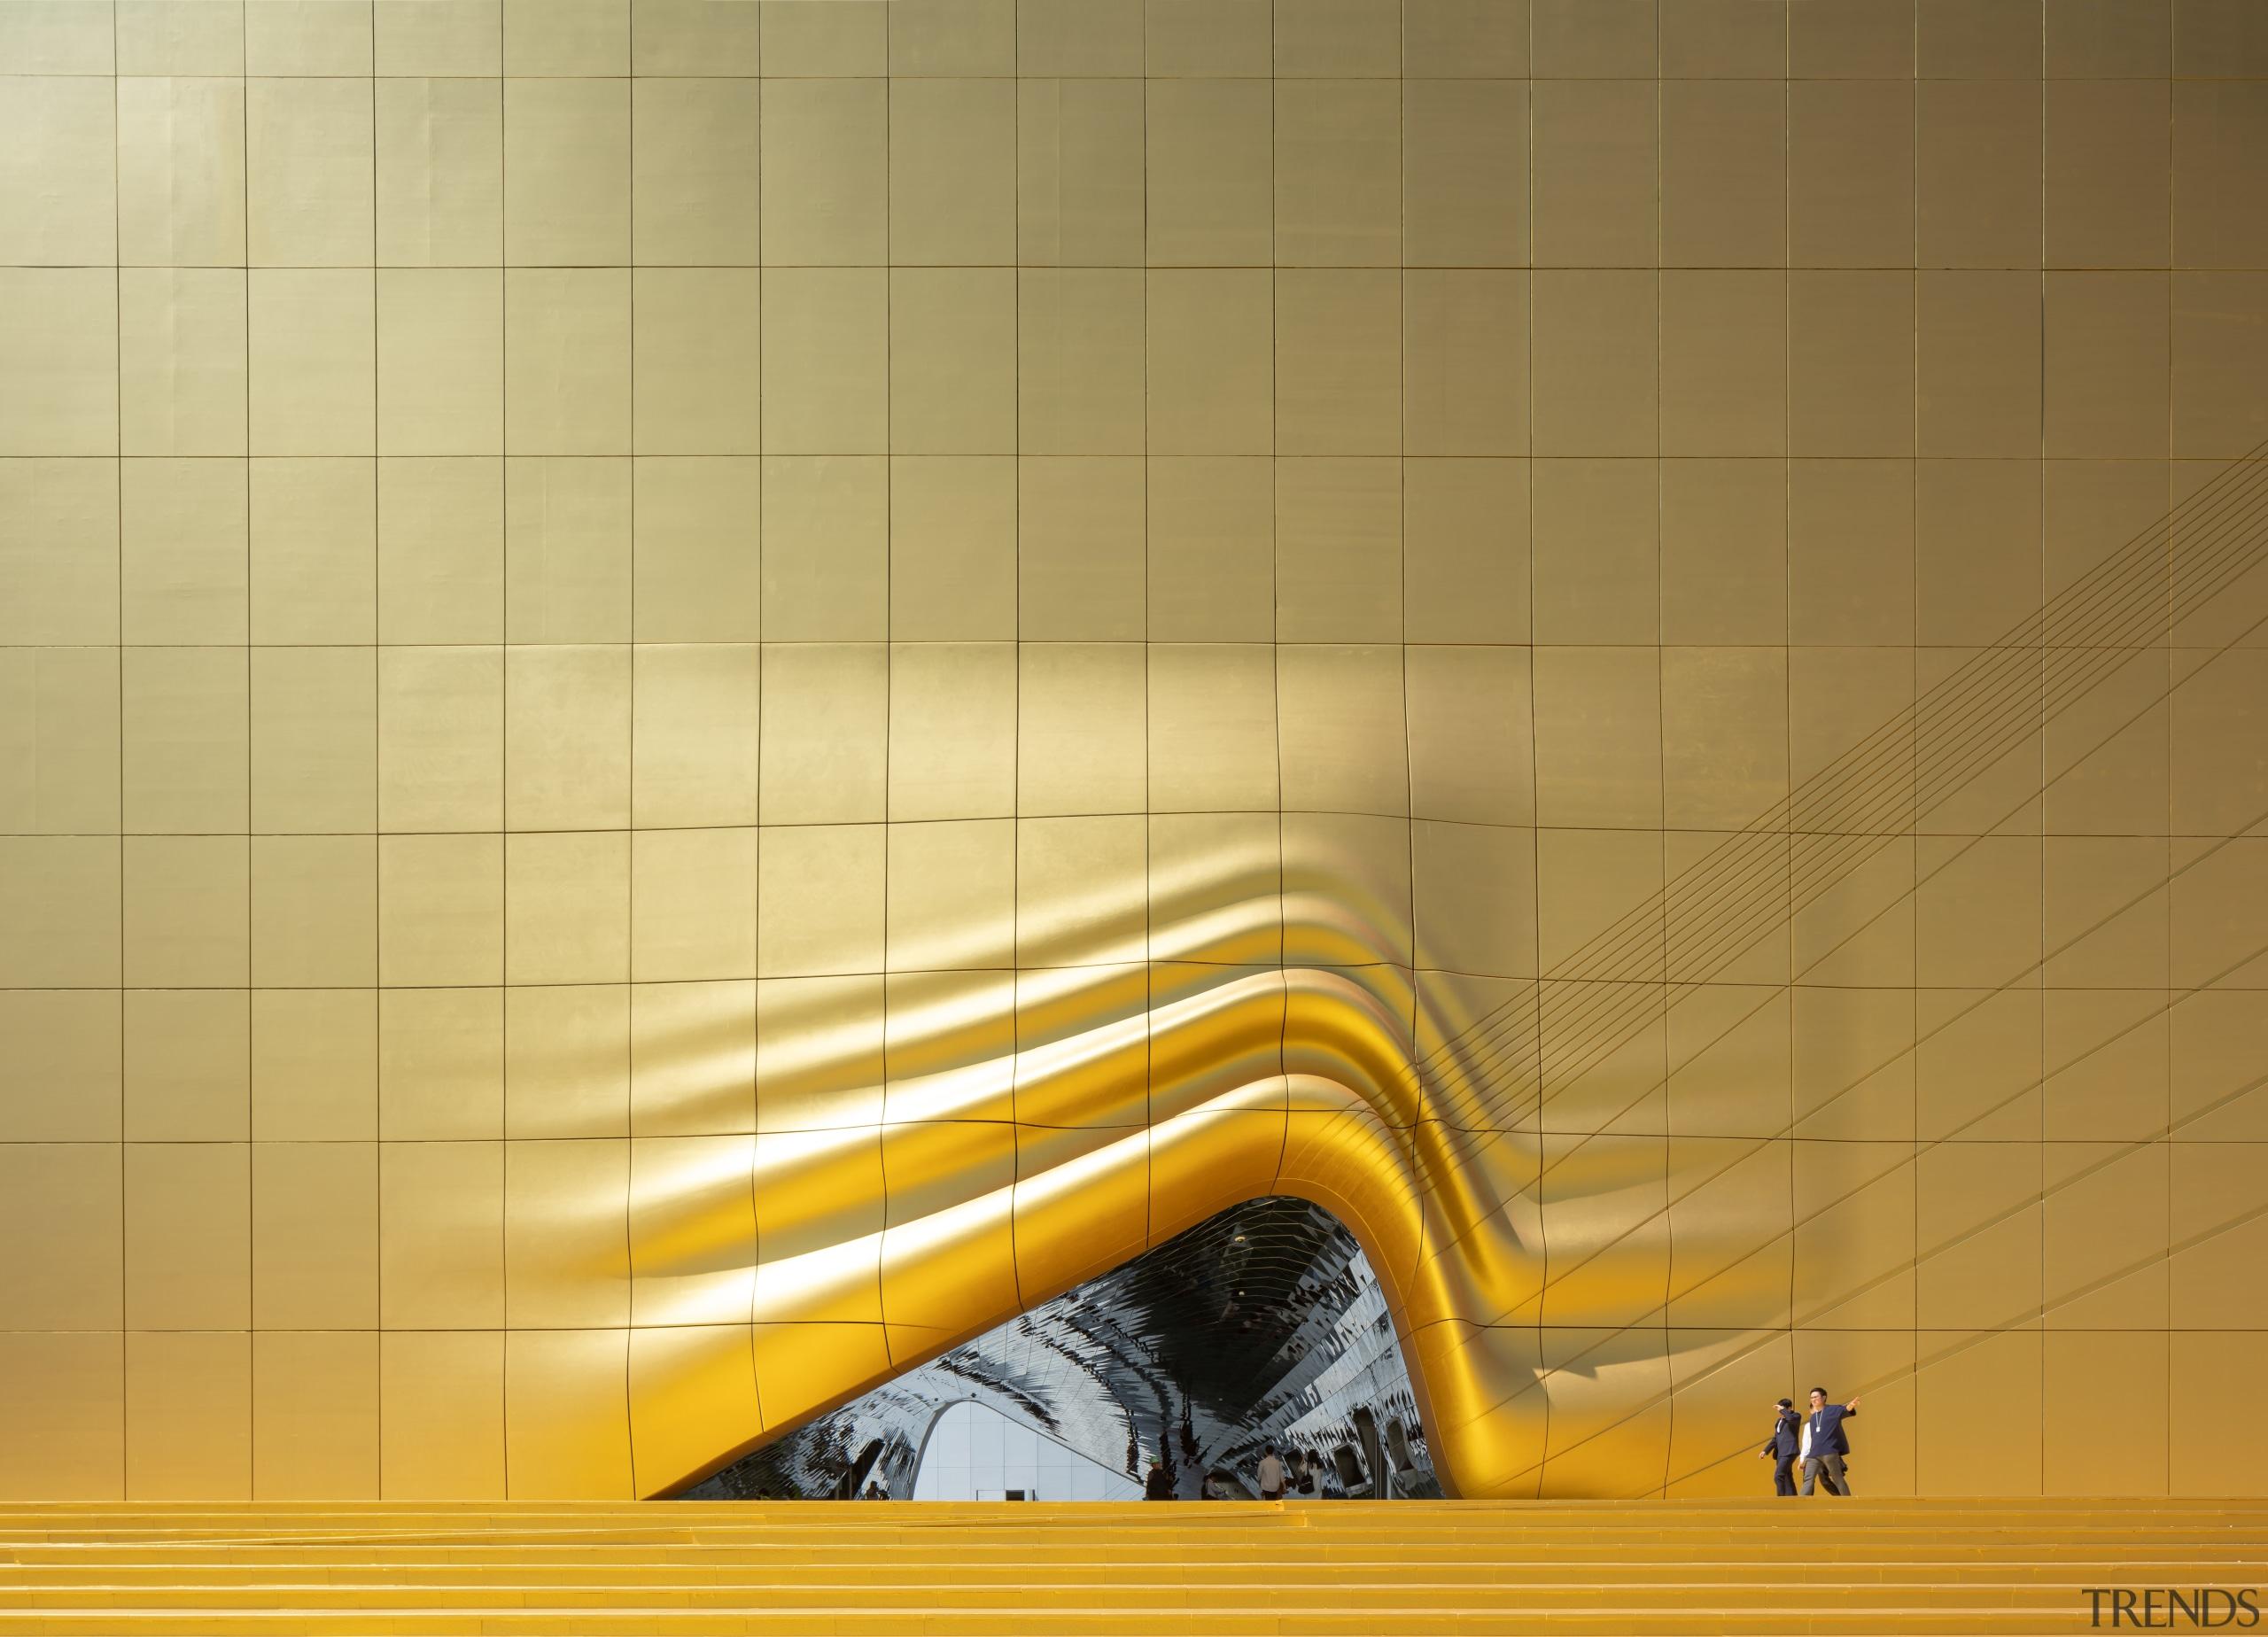 0995 - angle | ceiling | floor | angle, ceiling, floor, flooring, line, tile, wall, yellow, orange, brown